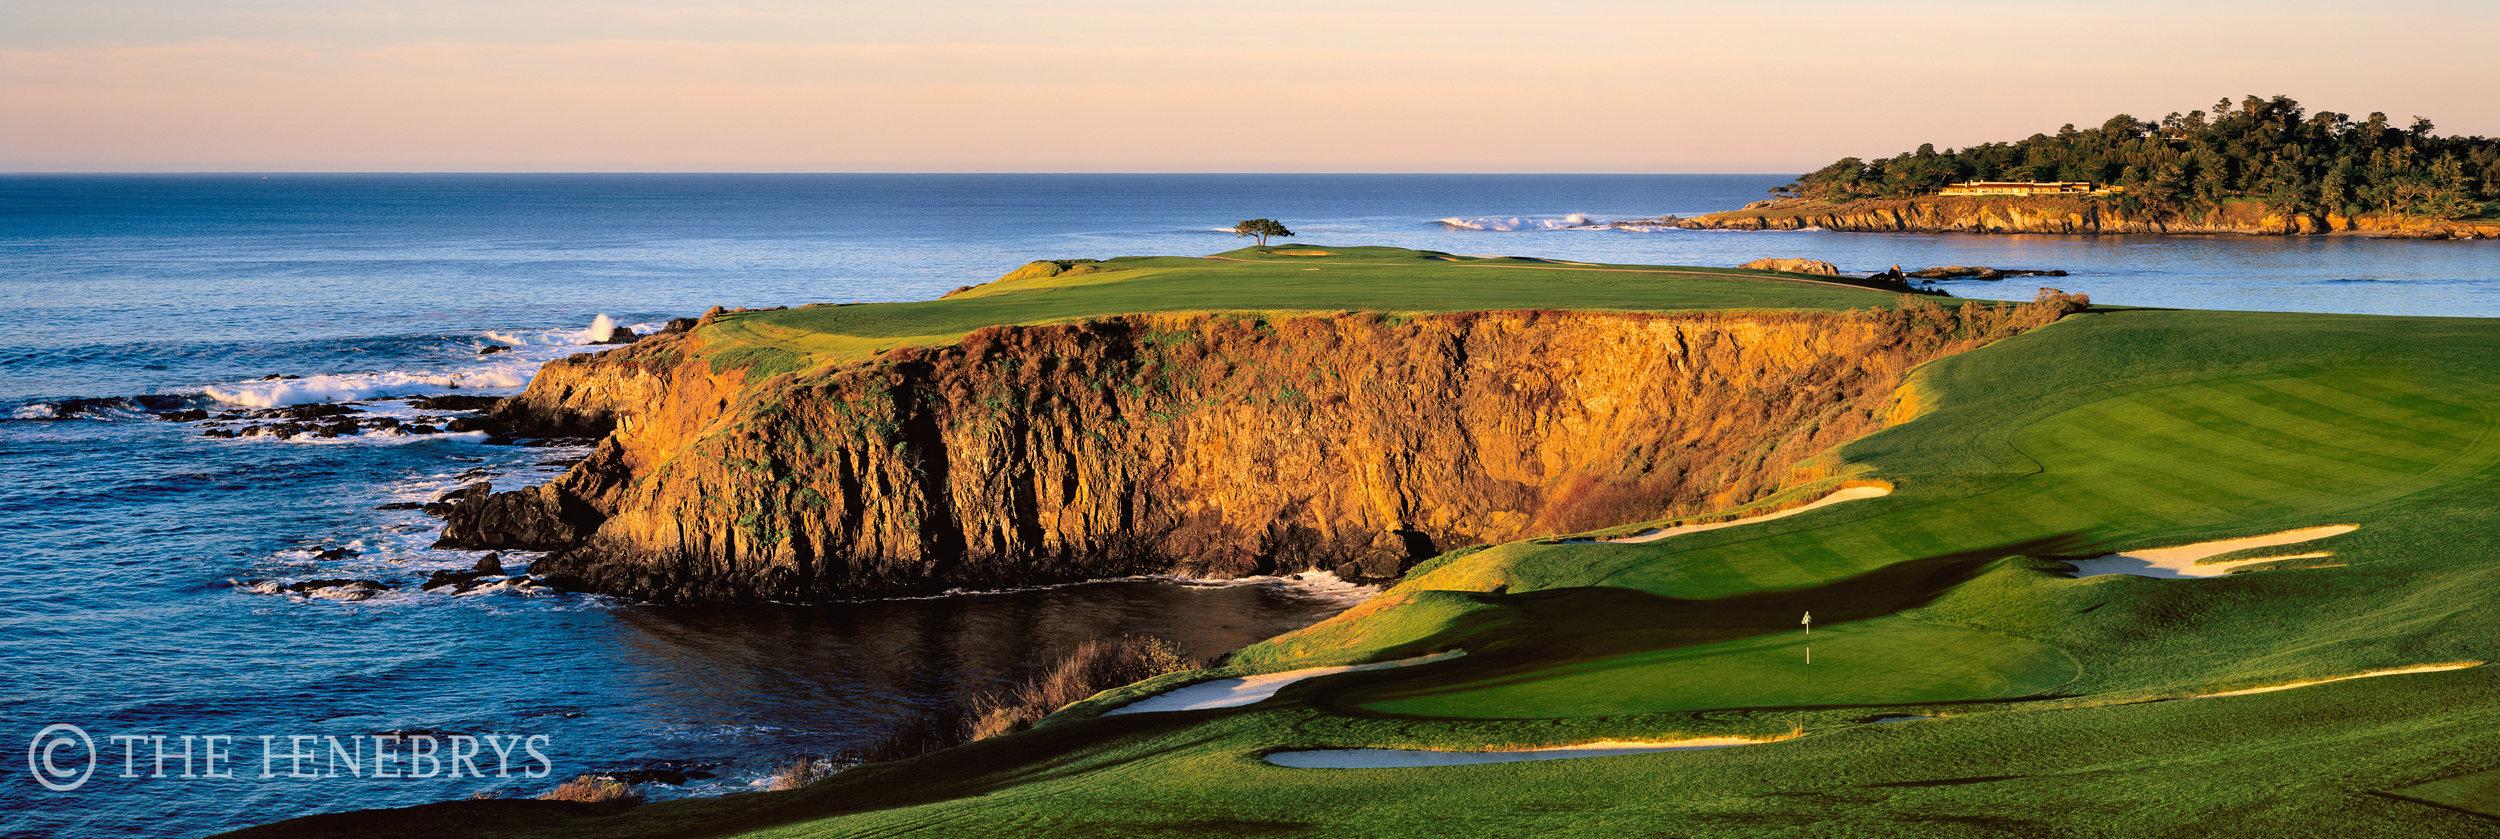 """By Dawn's Early Light"" 8th Pebble Beach Golf Links®, California"